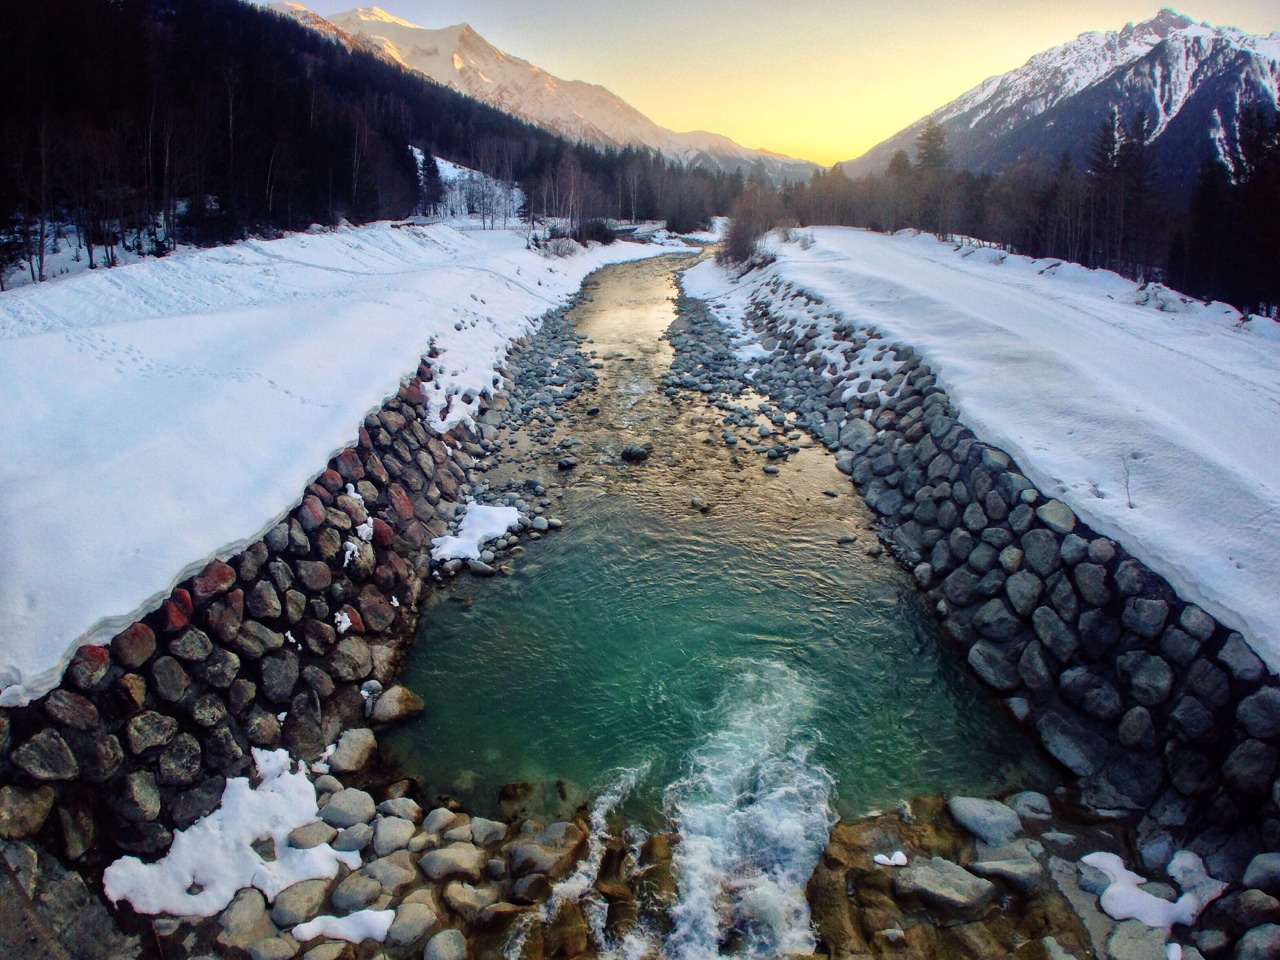 Good morning from Chamonix Mont-Blanc || #Chamonix #iPhoneOnly